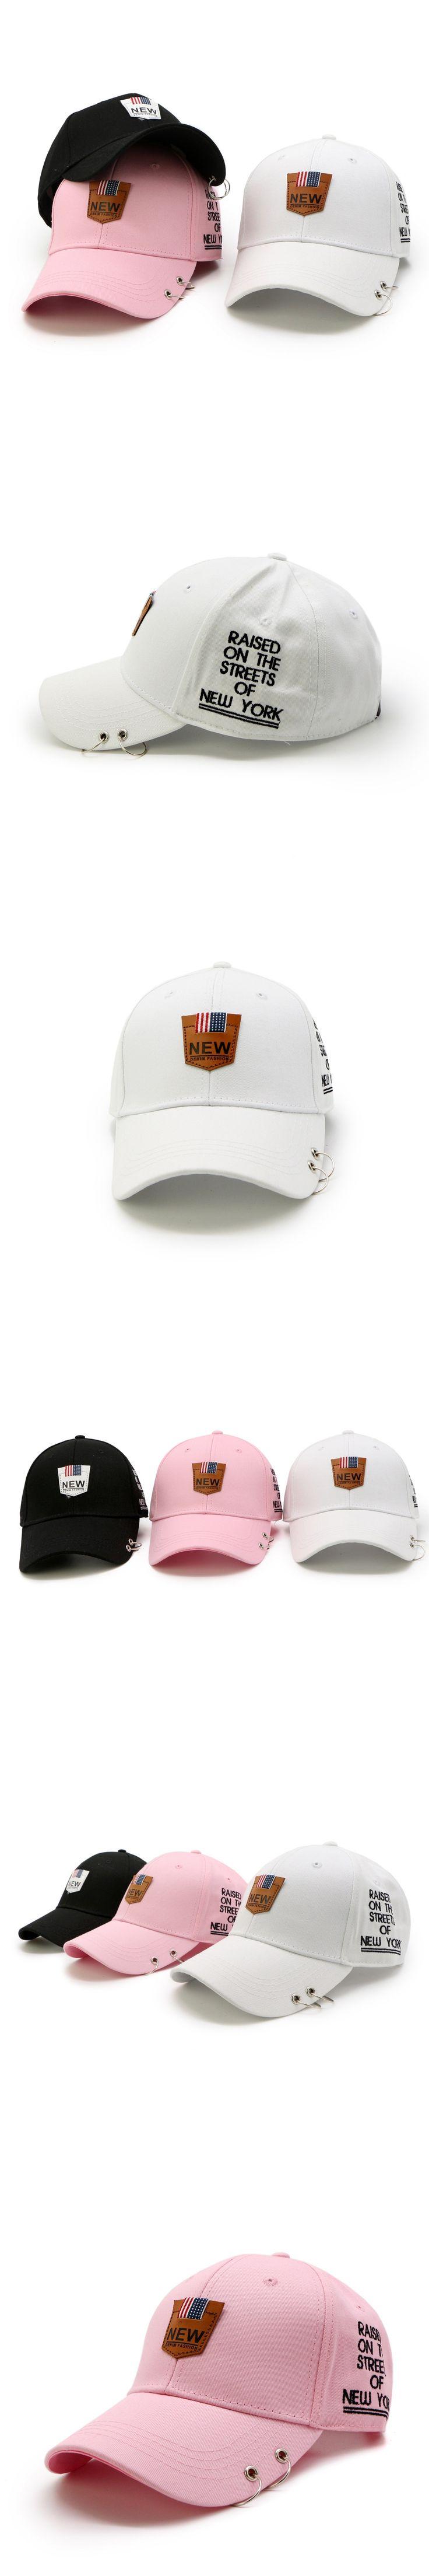 Iron ring baseball cap snapback hat spring Summer cotton cap hip hop fitted cap cheap hats for men women summer cap Punk Style